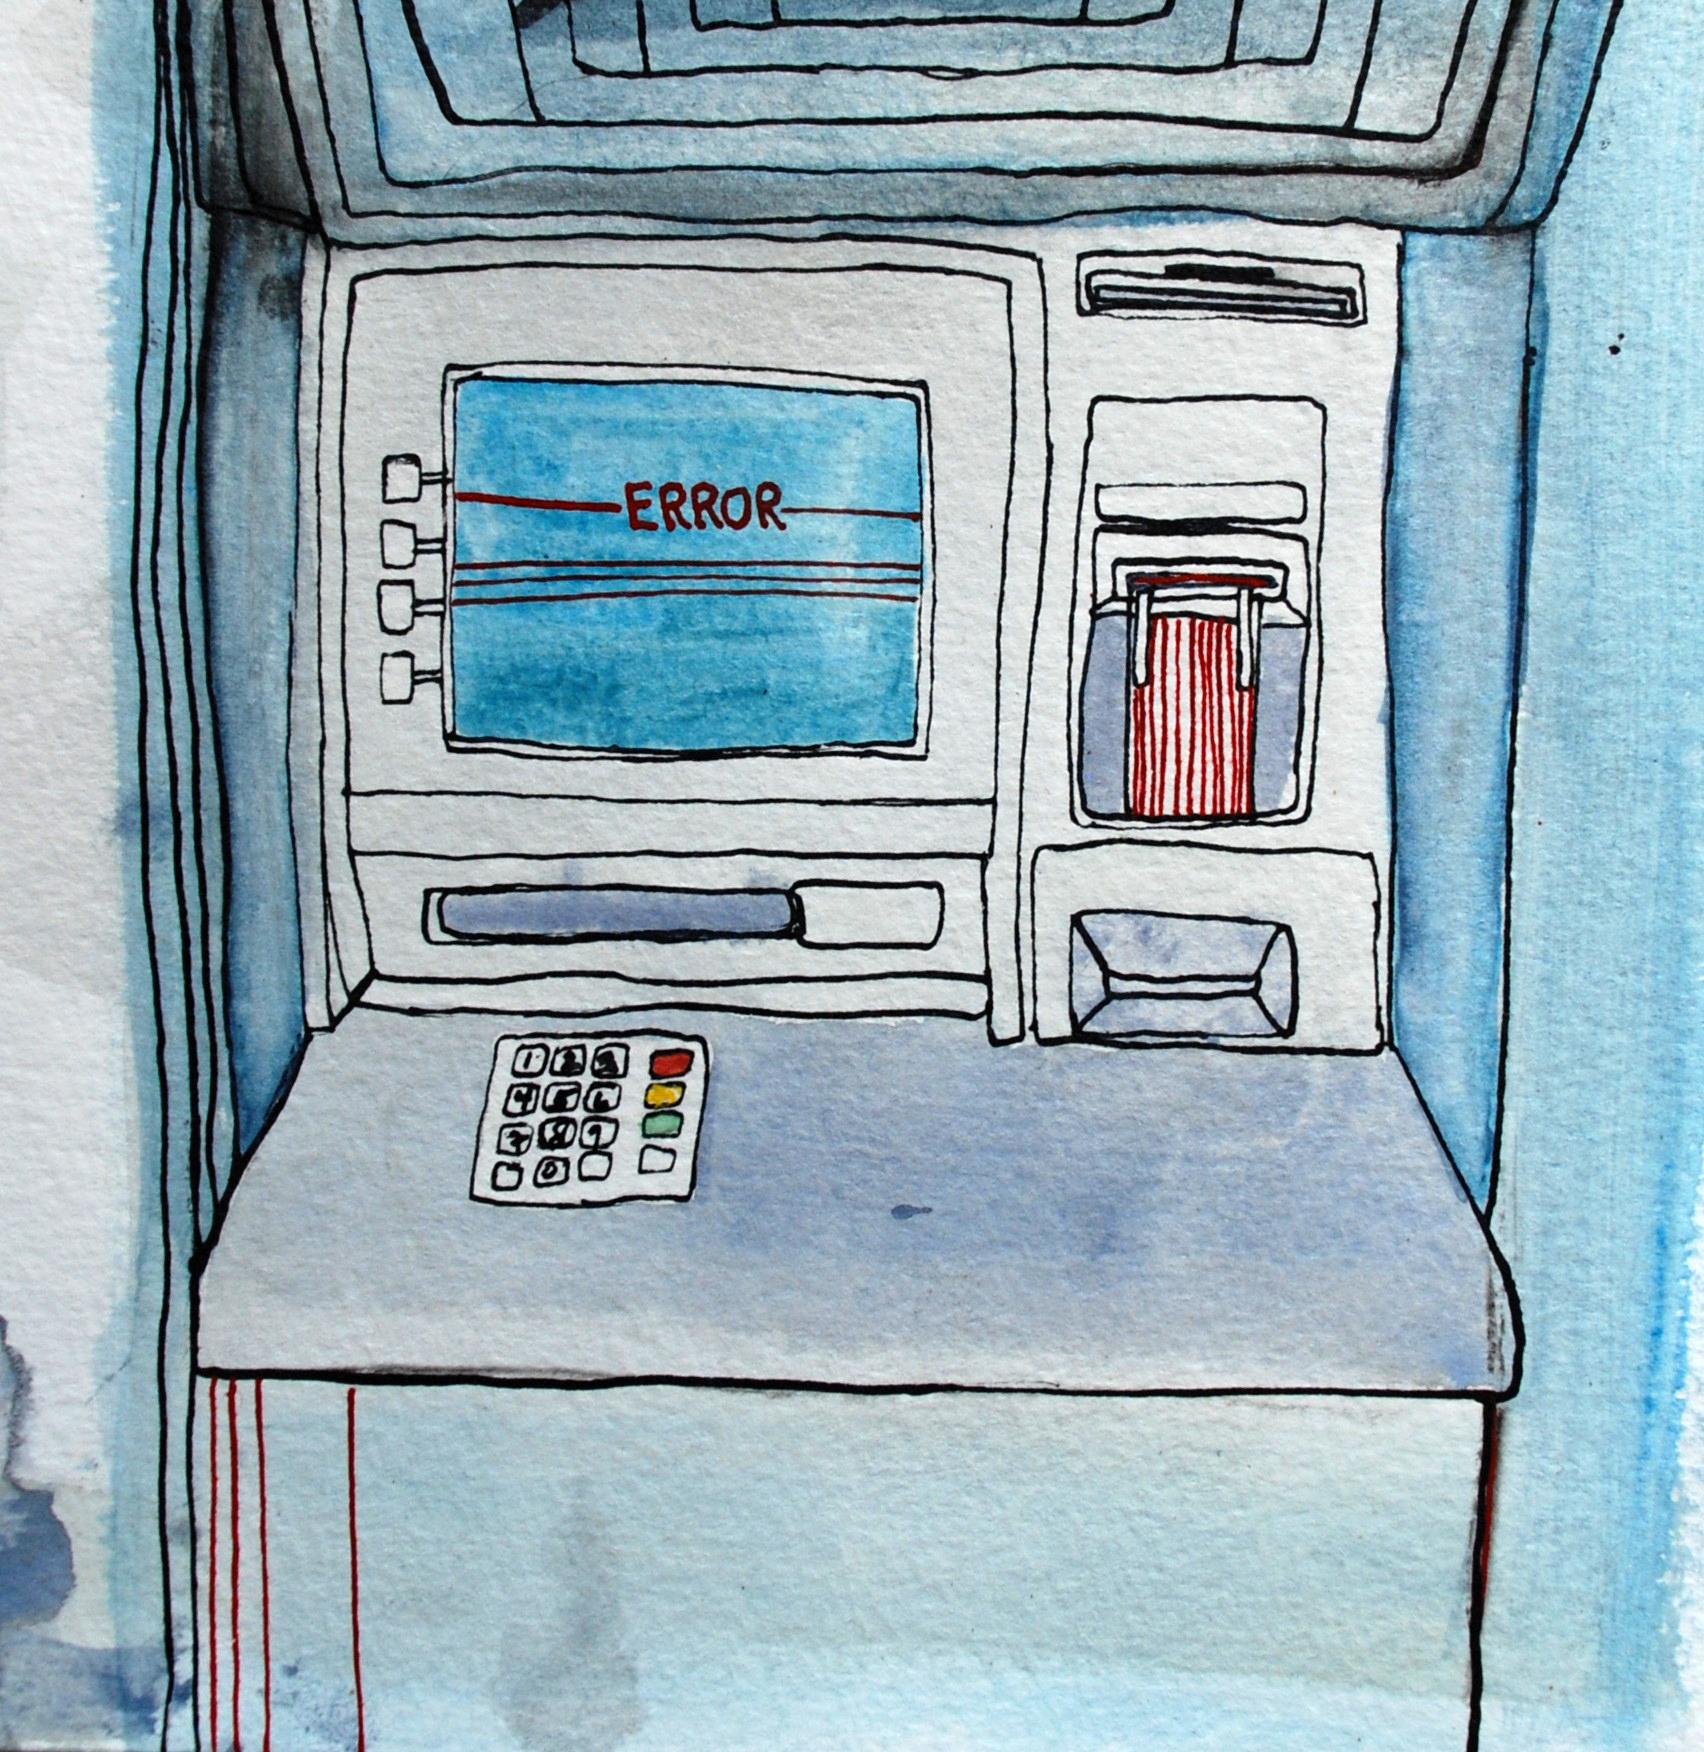 66: ATM Errors- Sold